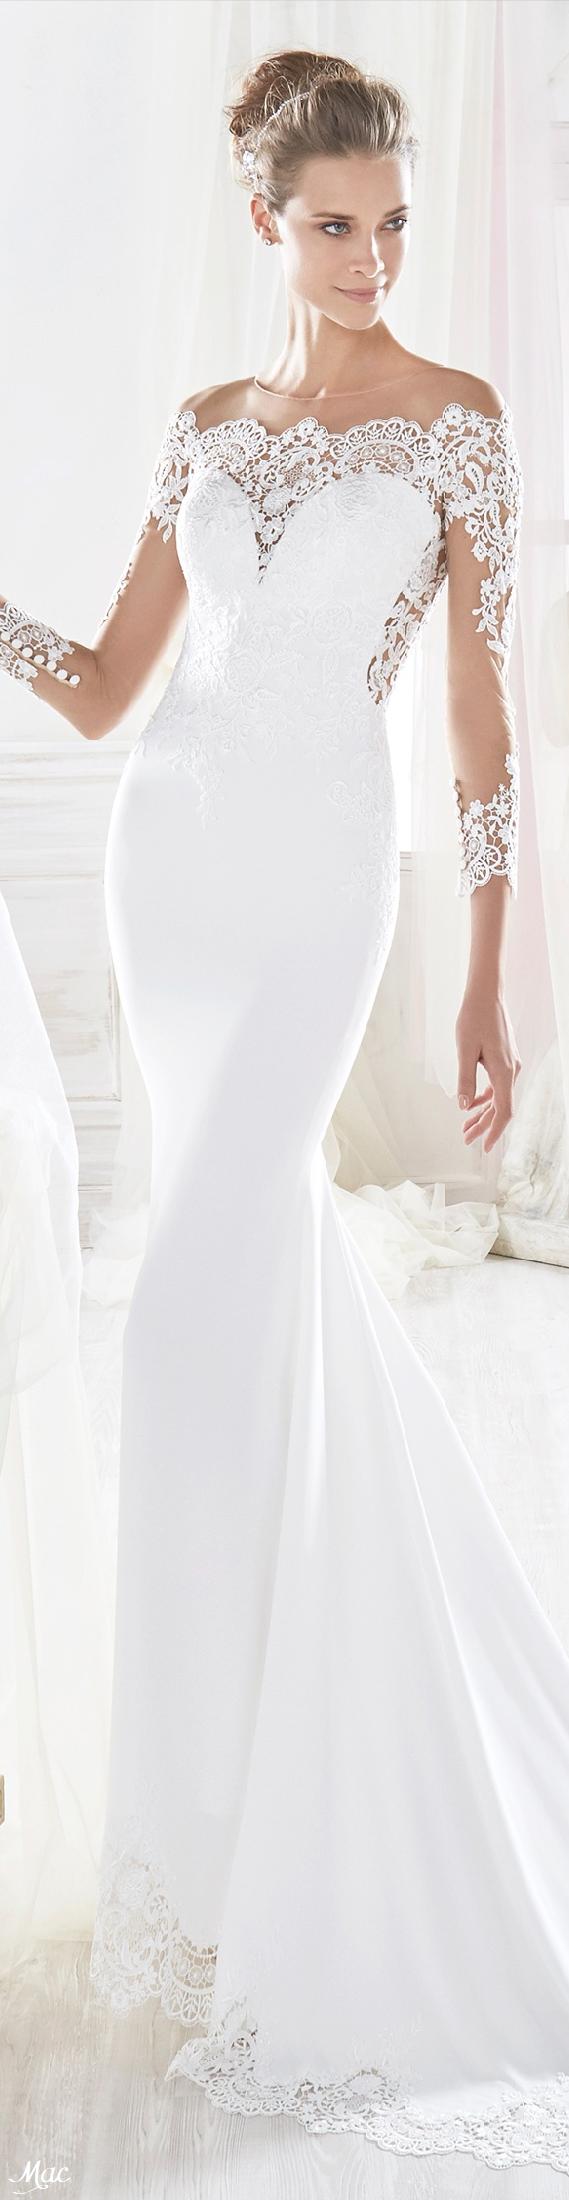 Spring bridal nicole collection wedding dresses pinterest